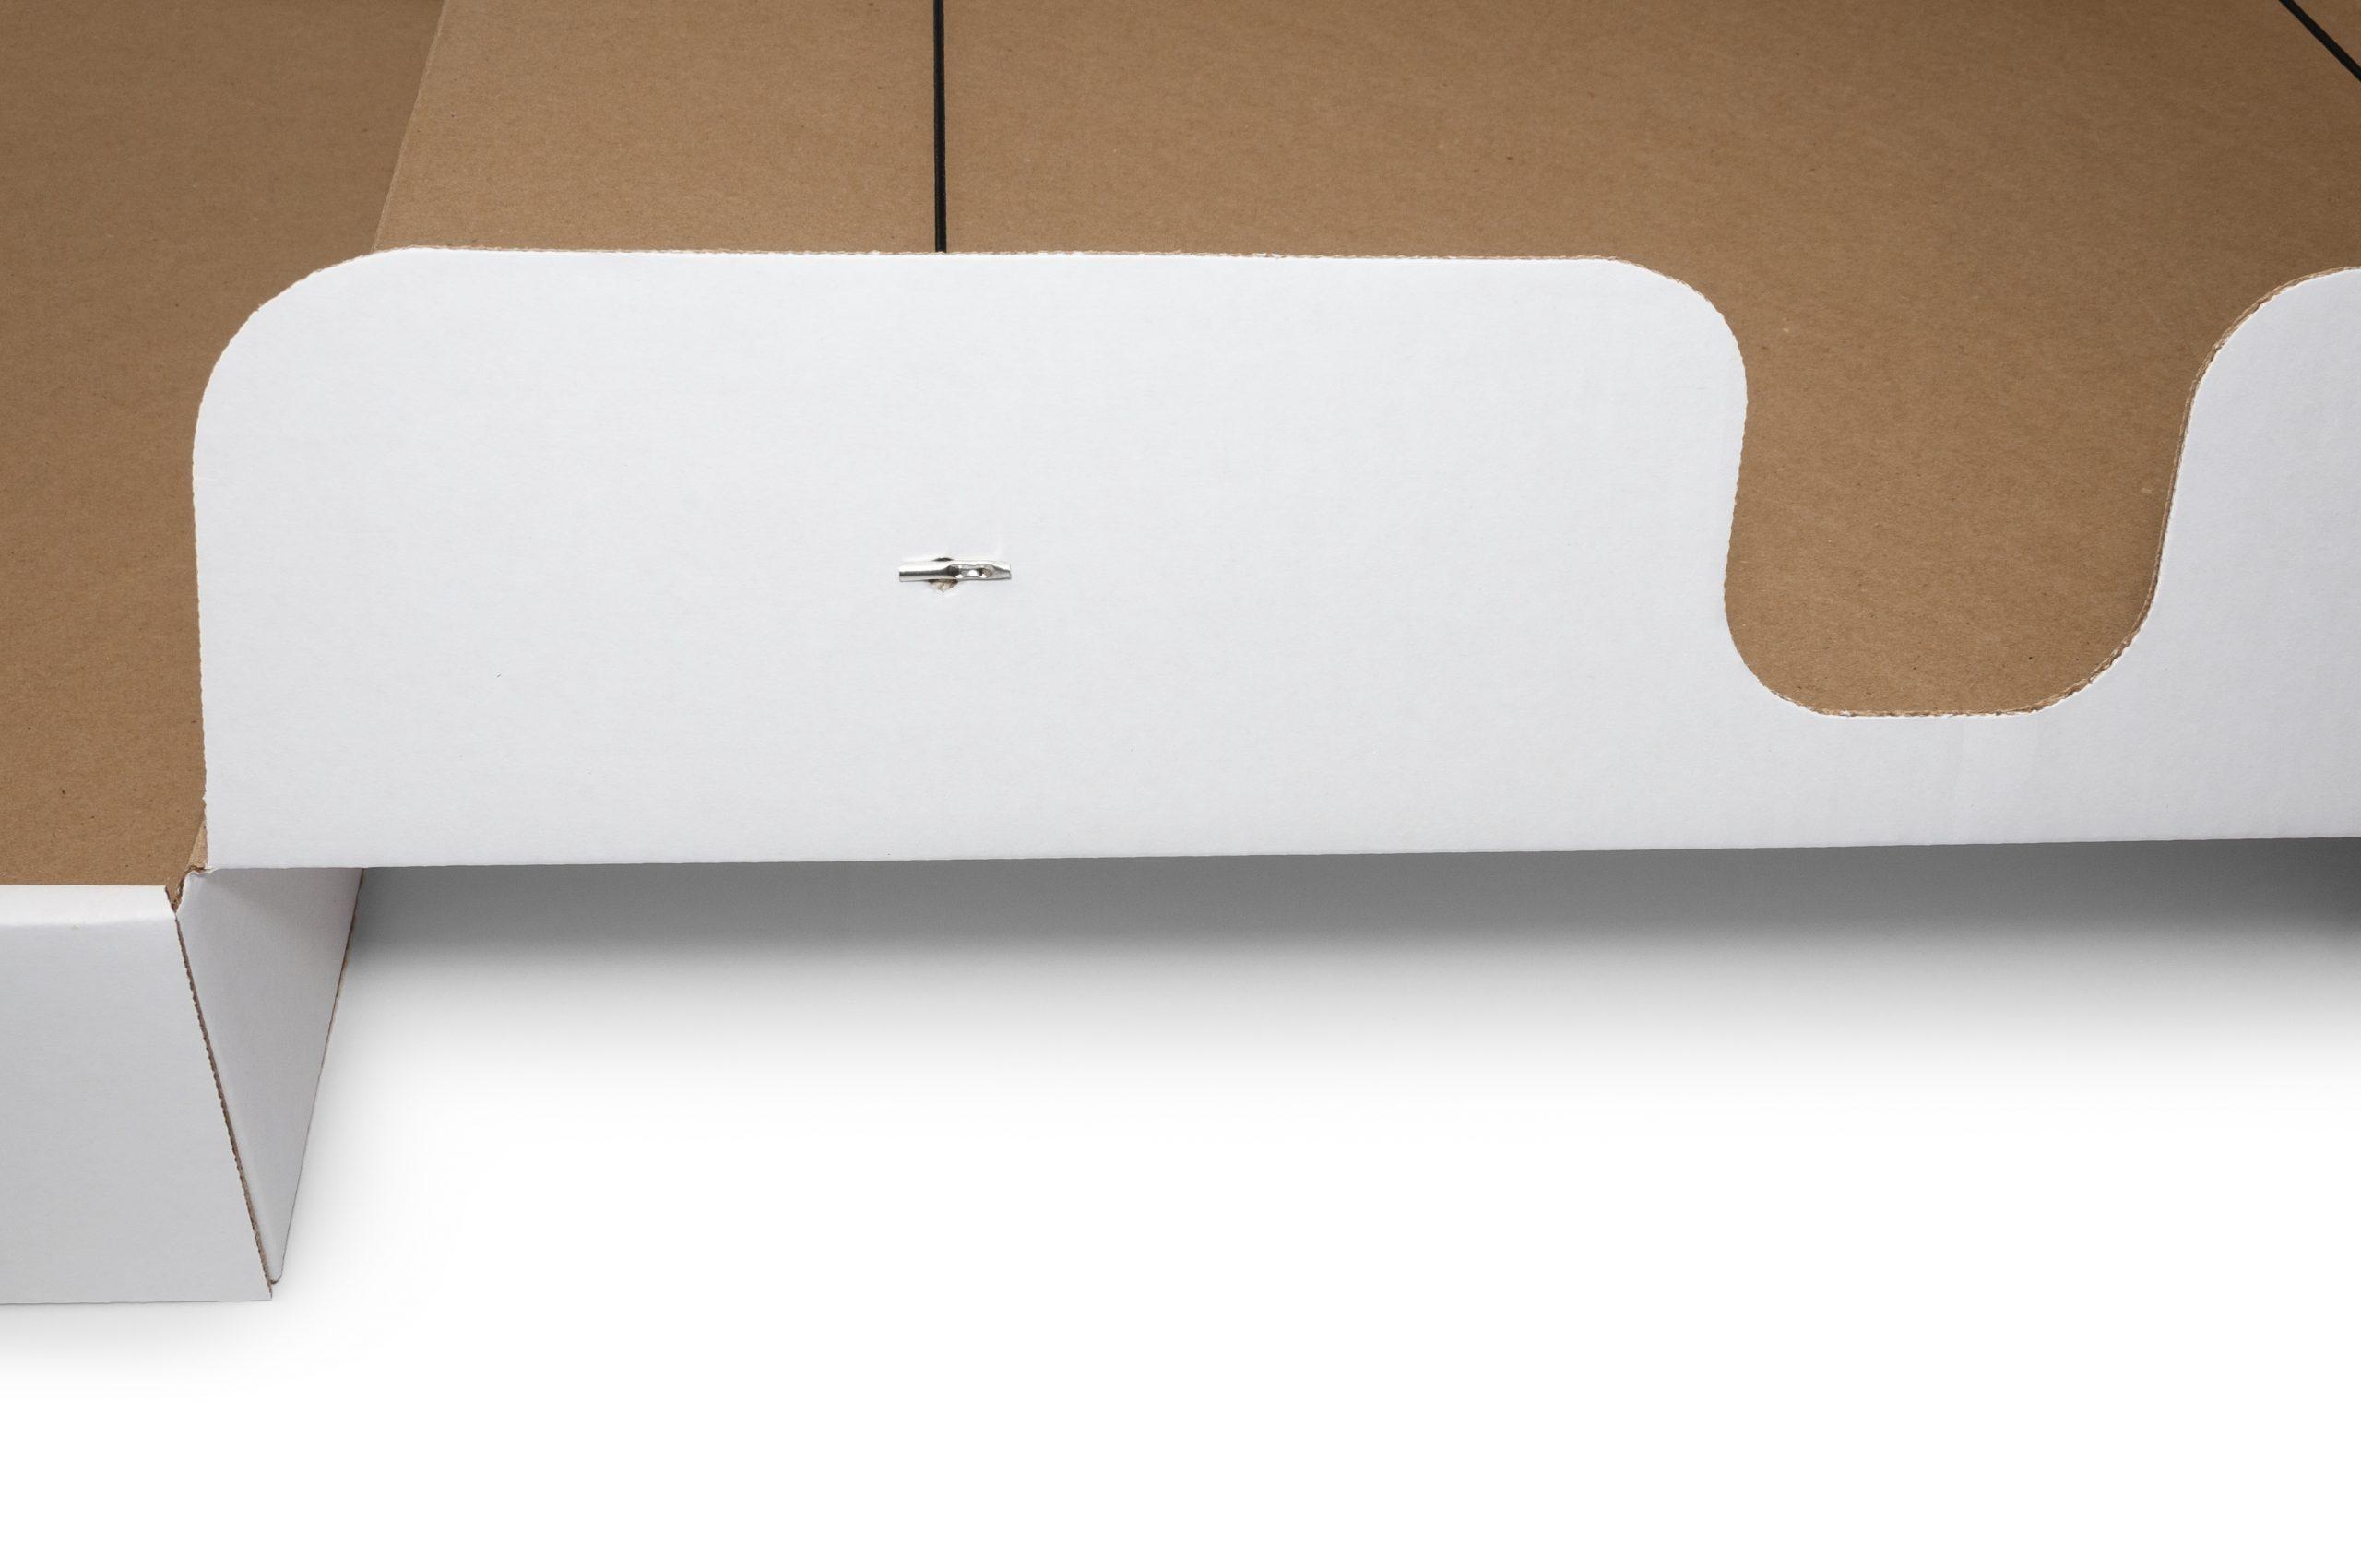 Bespoke Custom Packaging Design, Printing and Manufacturing